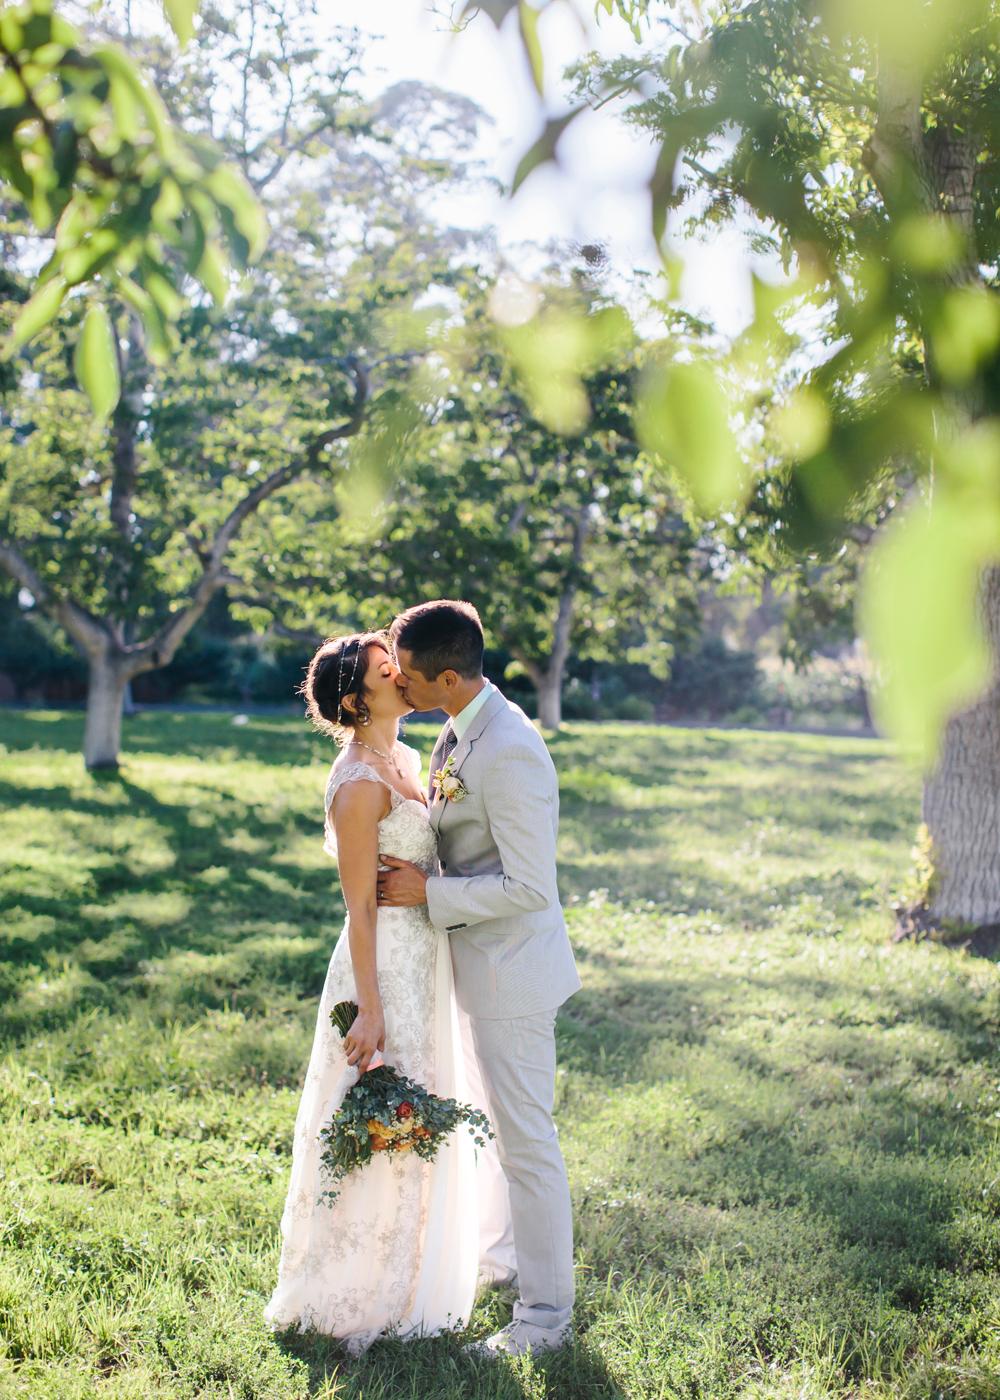 walnut-grove-los-angeles-wedding-photography-lilouette-46.jpg